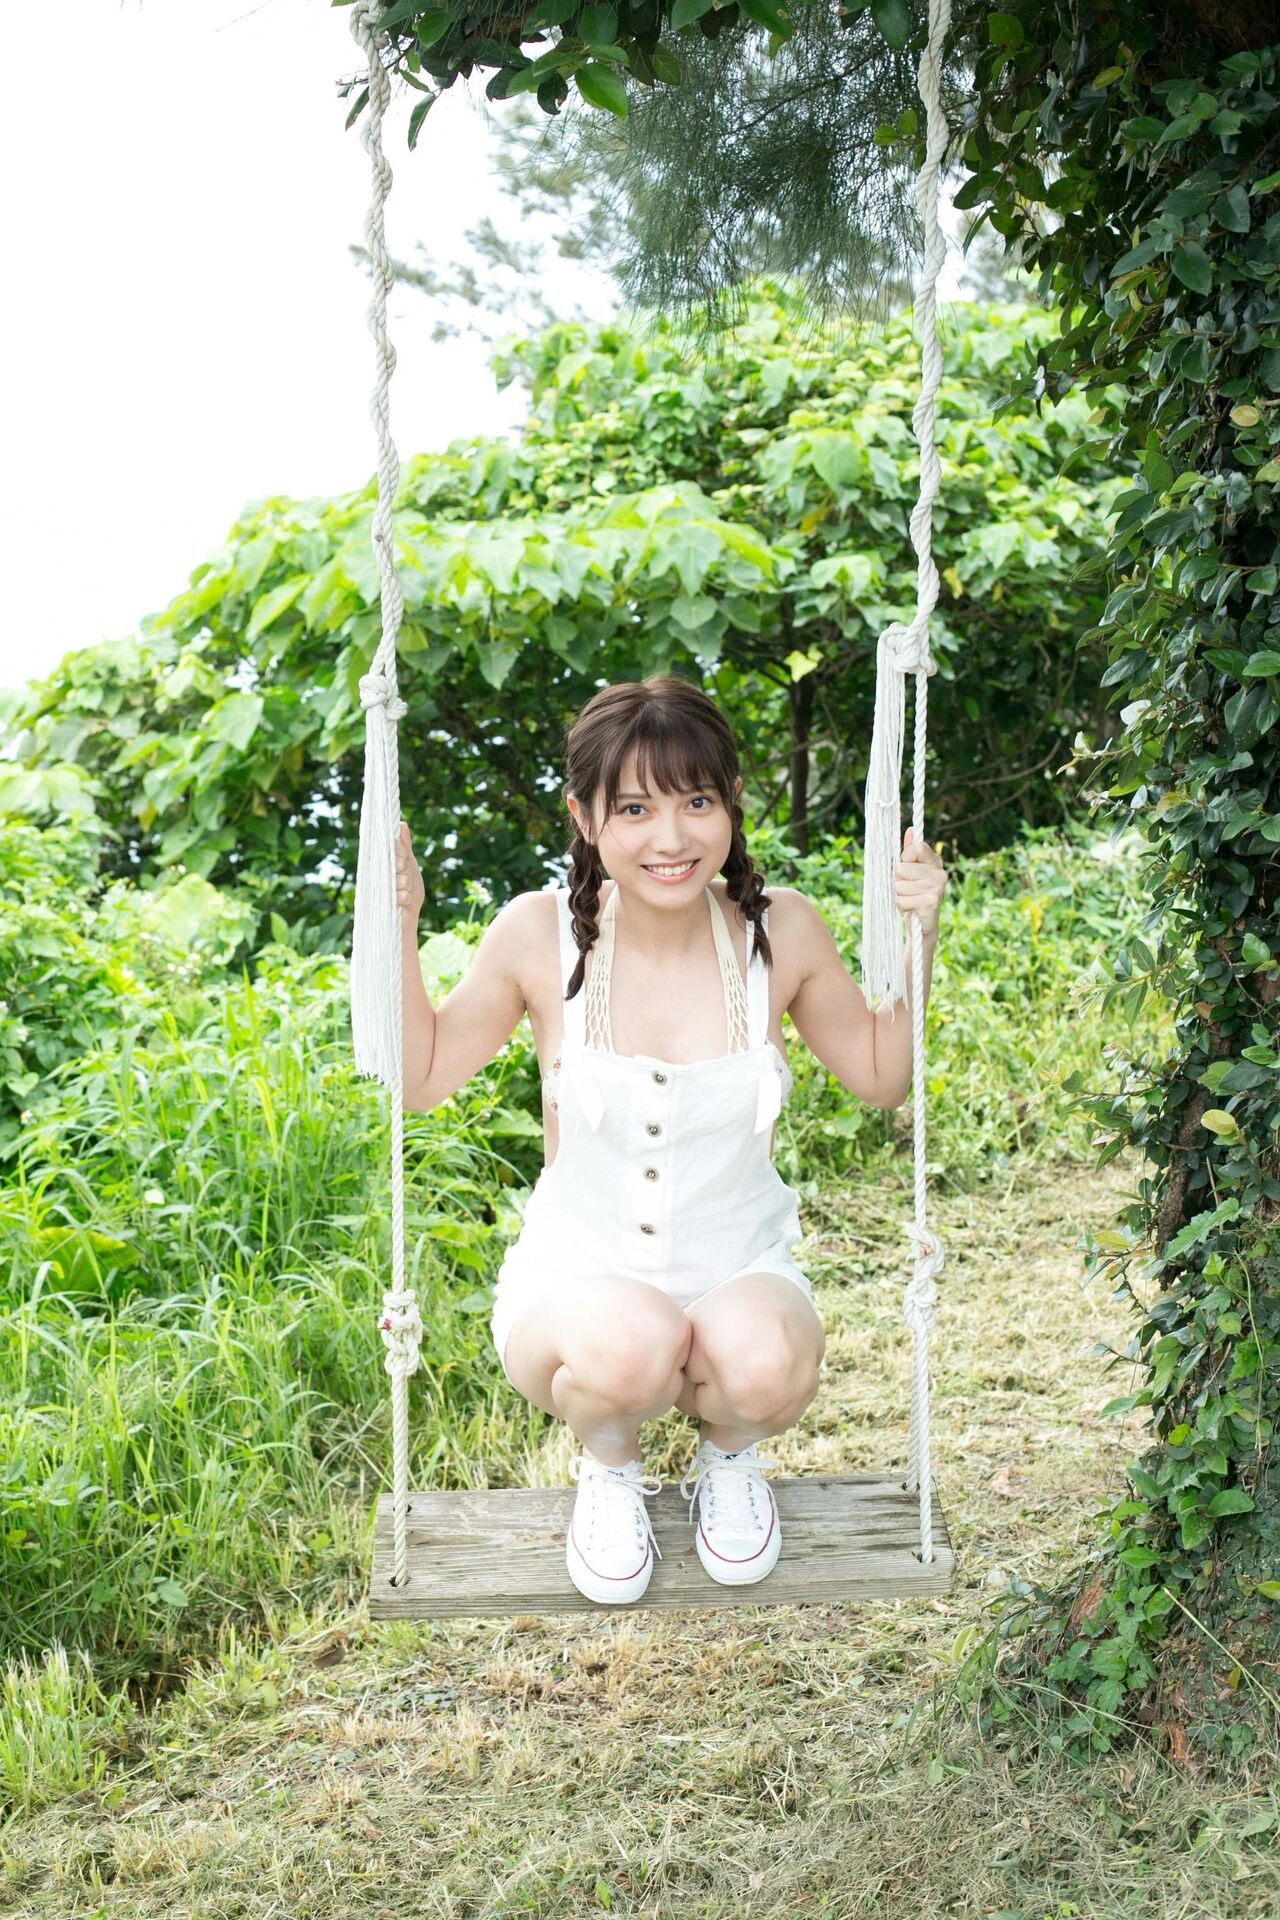 NMomotsuki EnTame 2105 04.jpg